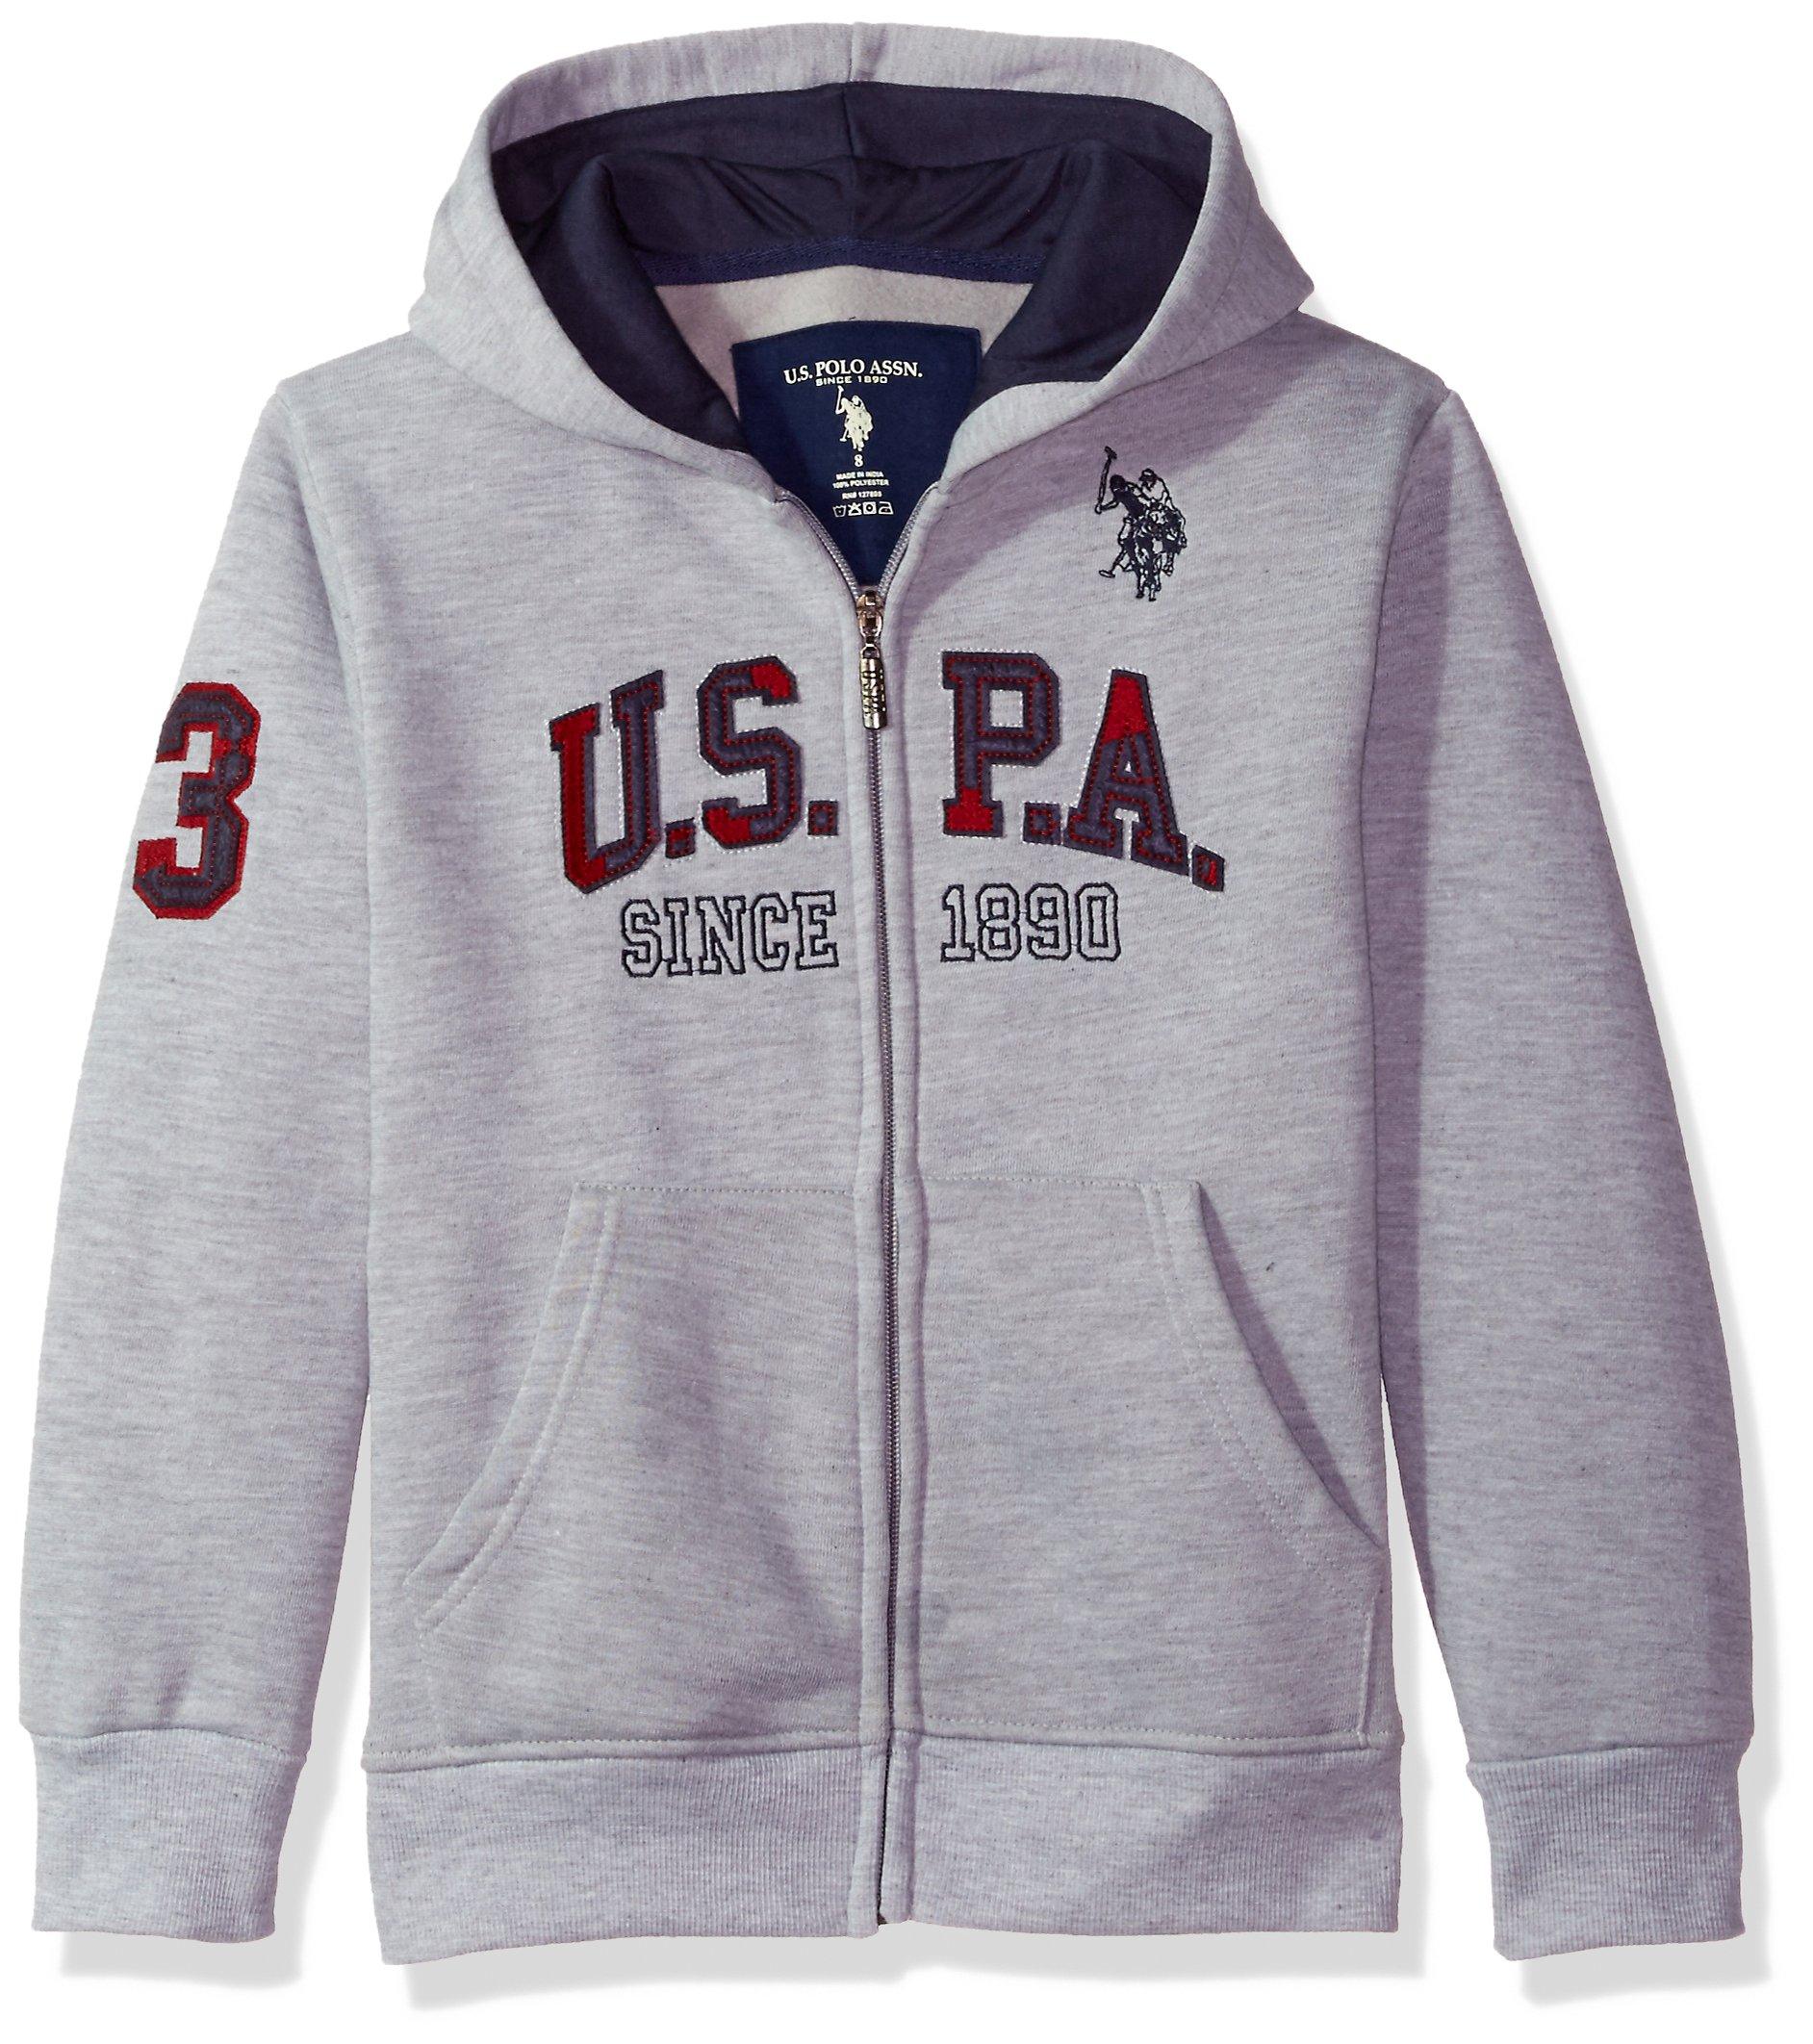 U.S. Polo Assn. Big Boys' Hooded Zip or Snap Fleece Jacket, All All Star Light Heather Gray 8